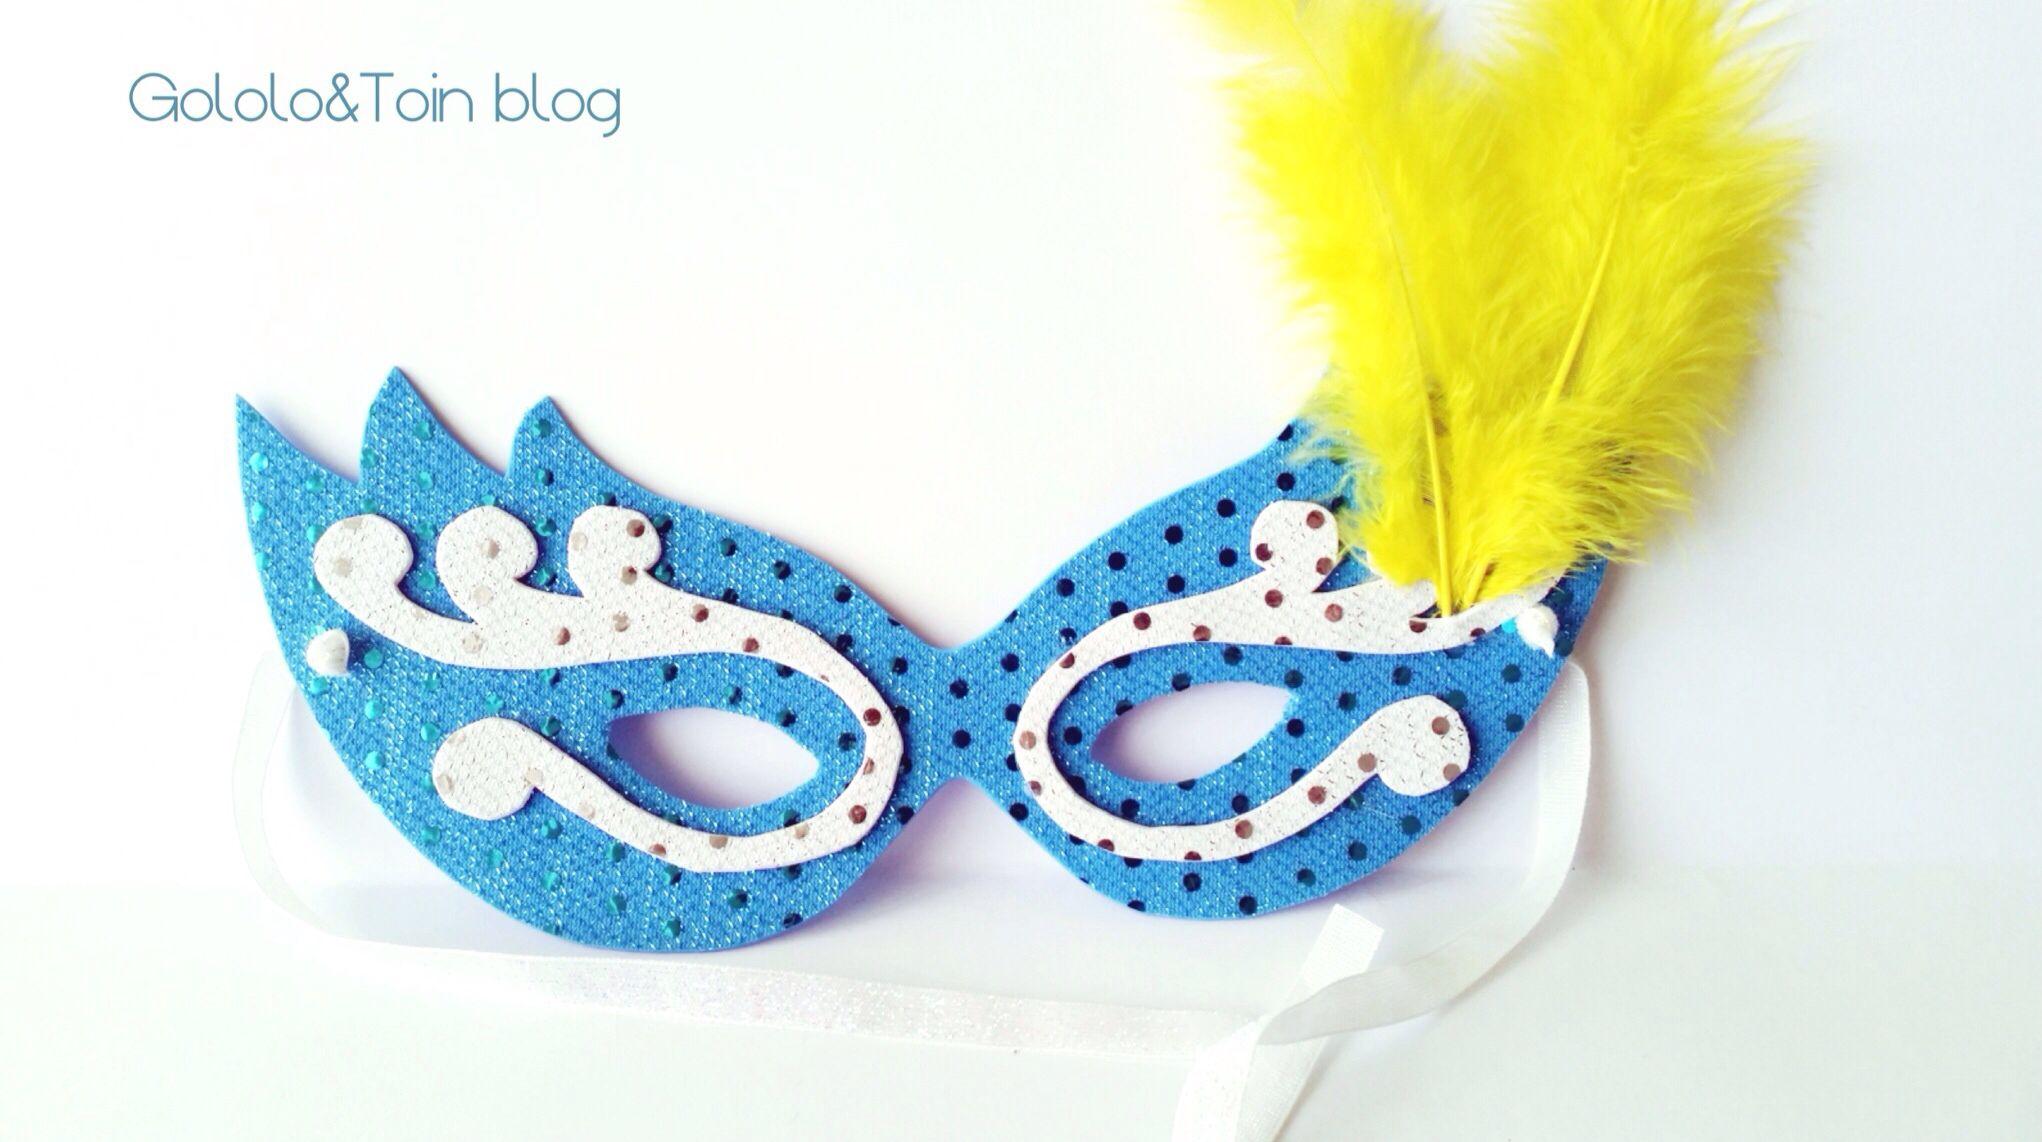 M scara veneciana en goma eva costume pinterest m scaras venecianas carnaval diy y carnaval - Mascaras para carnaval manualidades ...